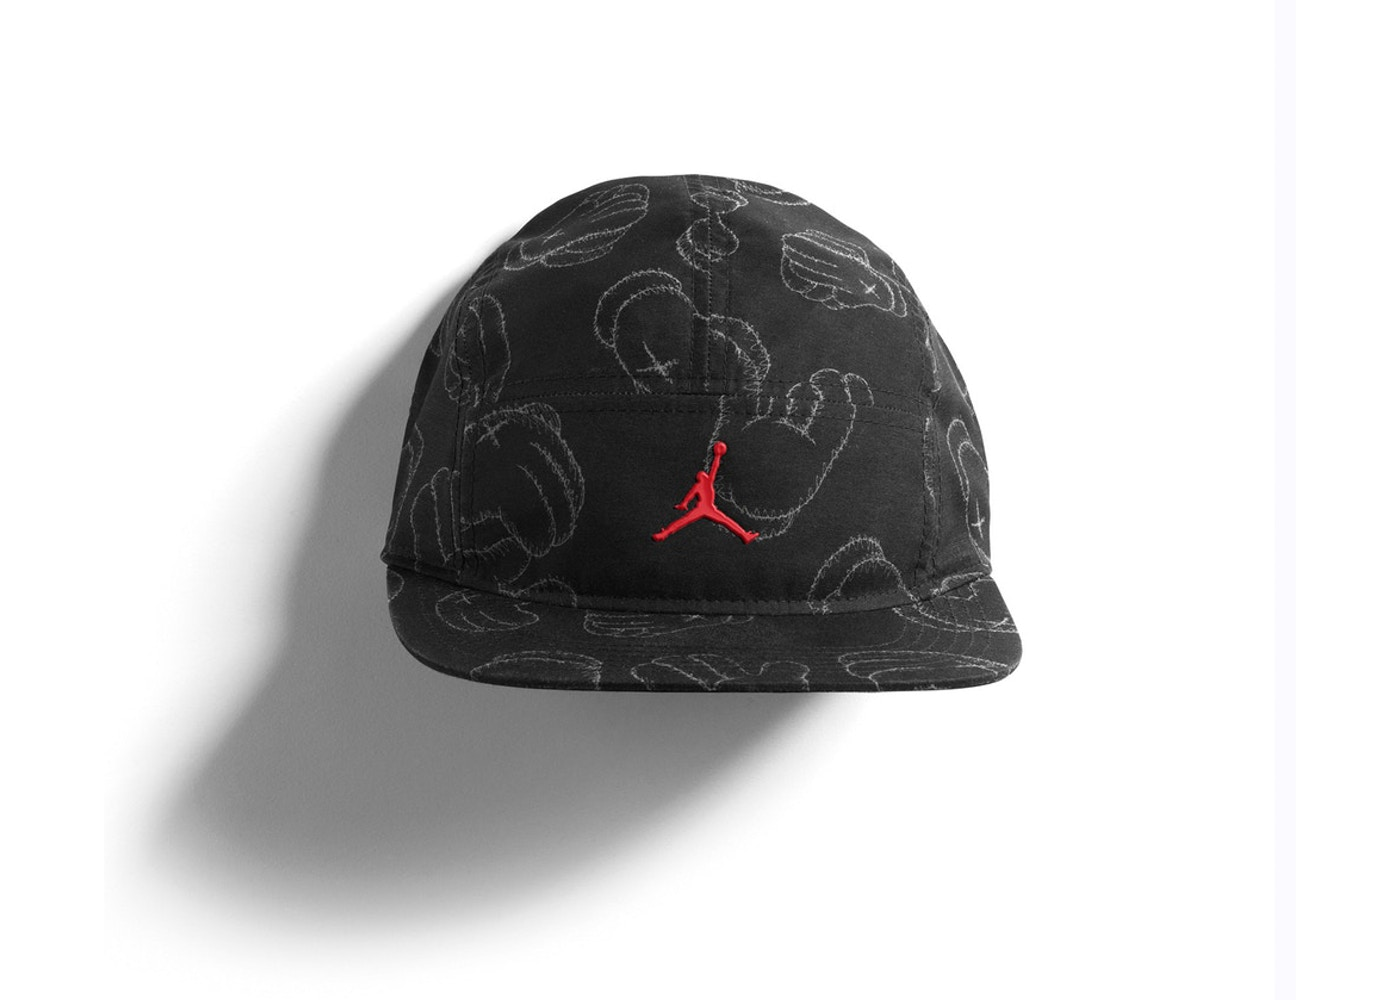 newest bf97b 56206 KAWS x Jordan 5-Panel Cap Black